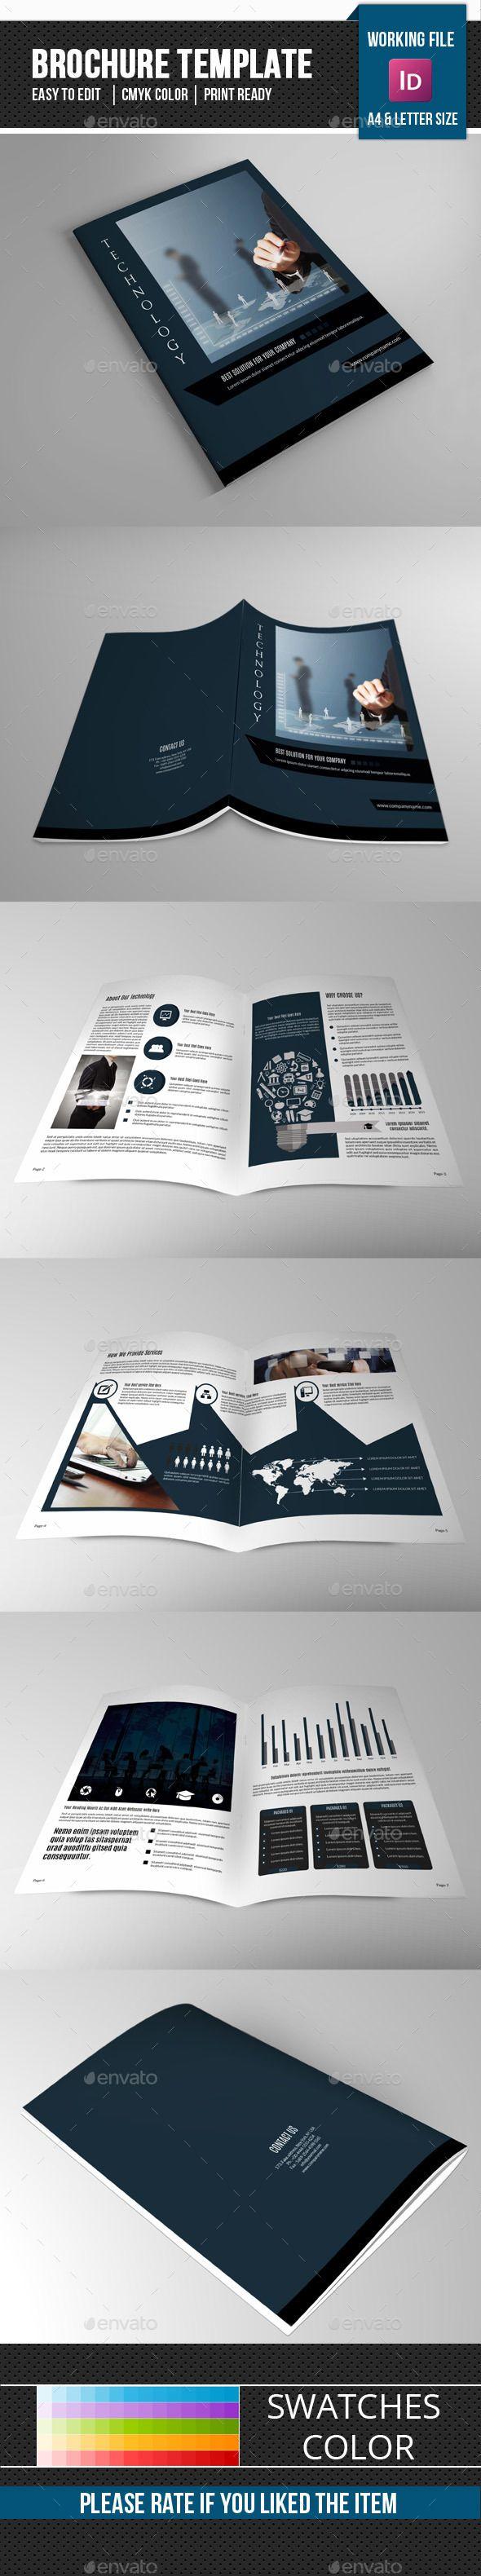 Technology Brochure TemplateV  Brochure Template Brochures